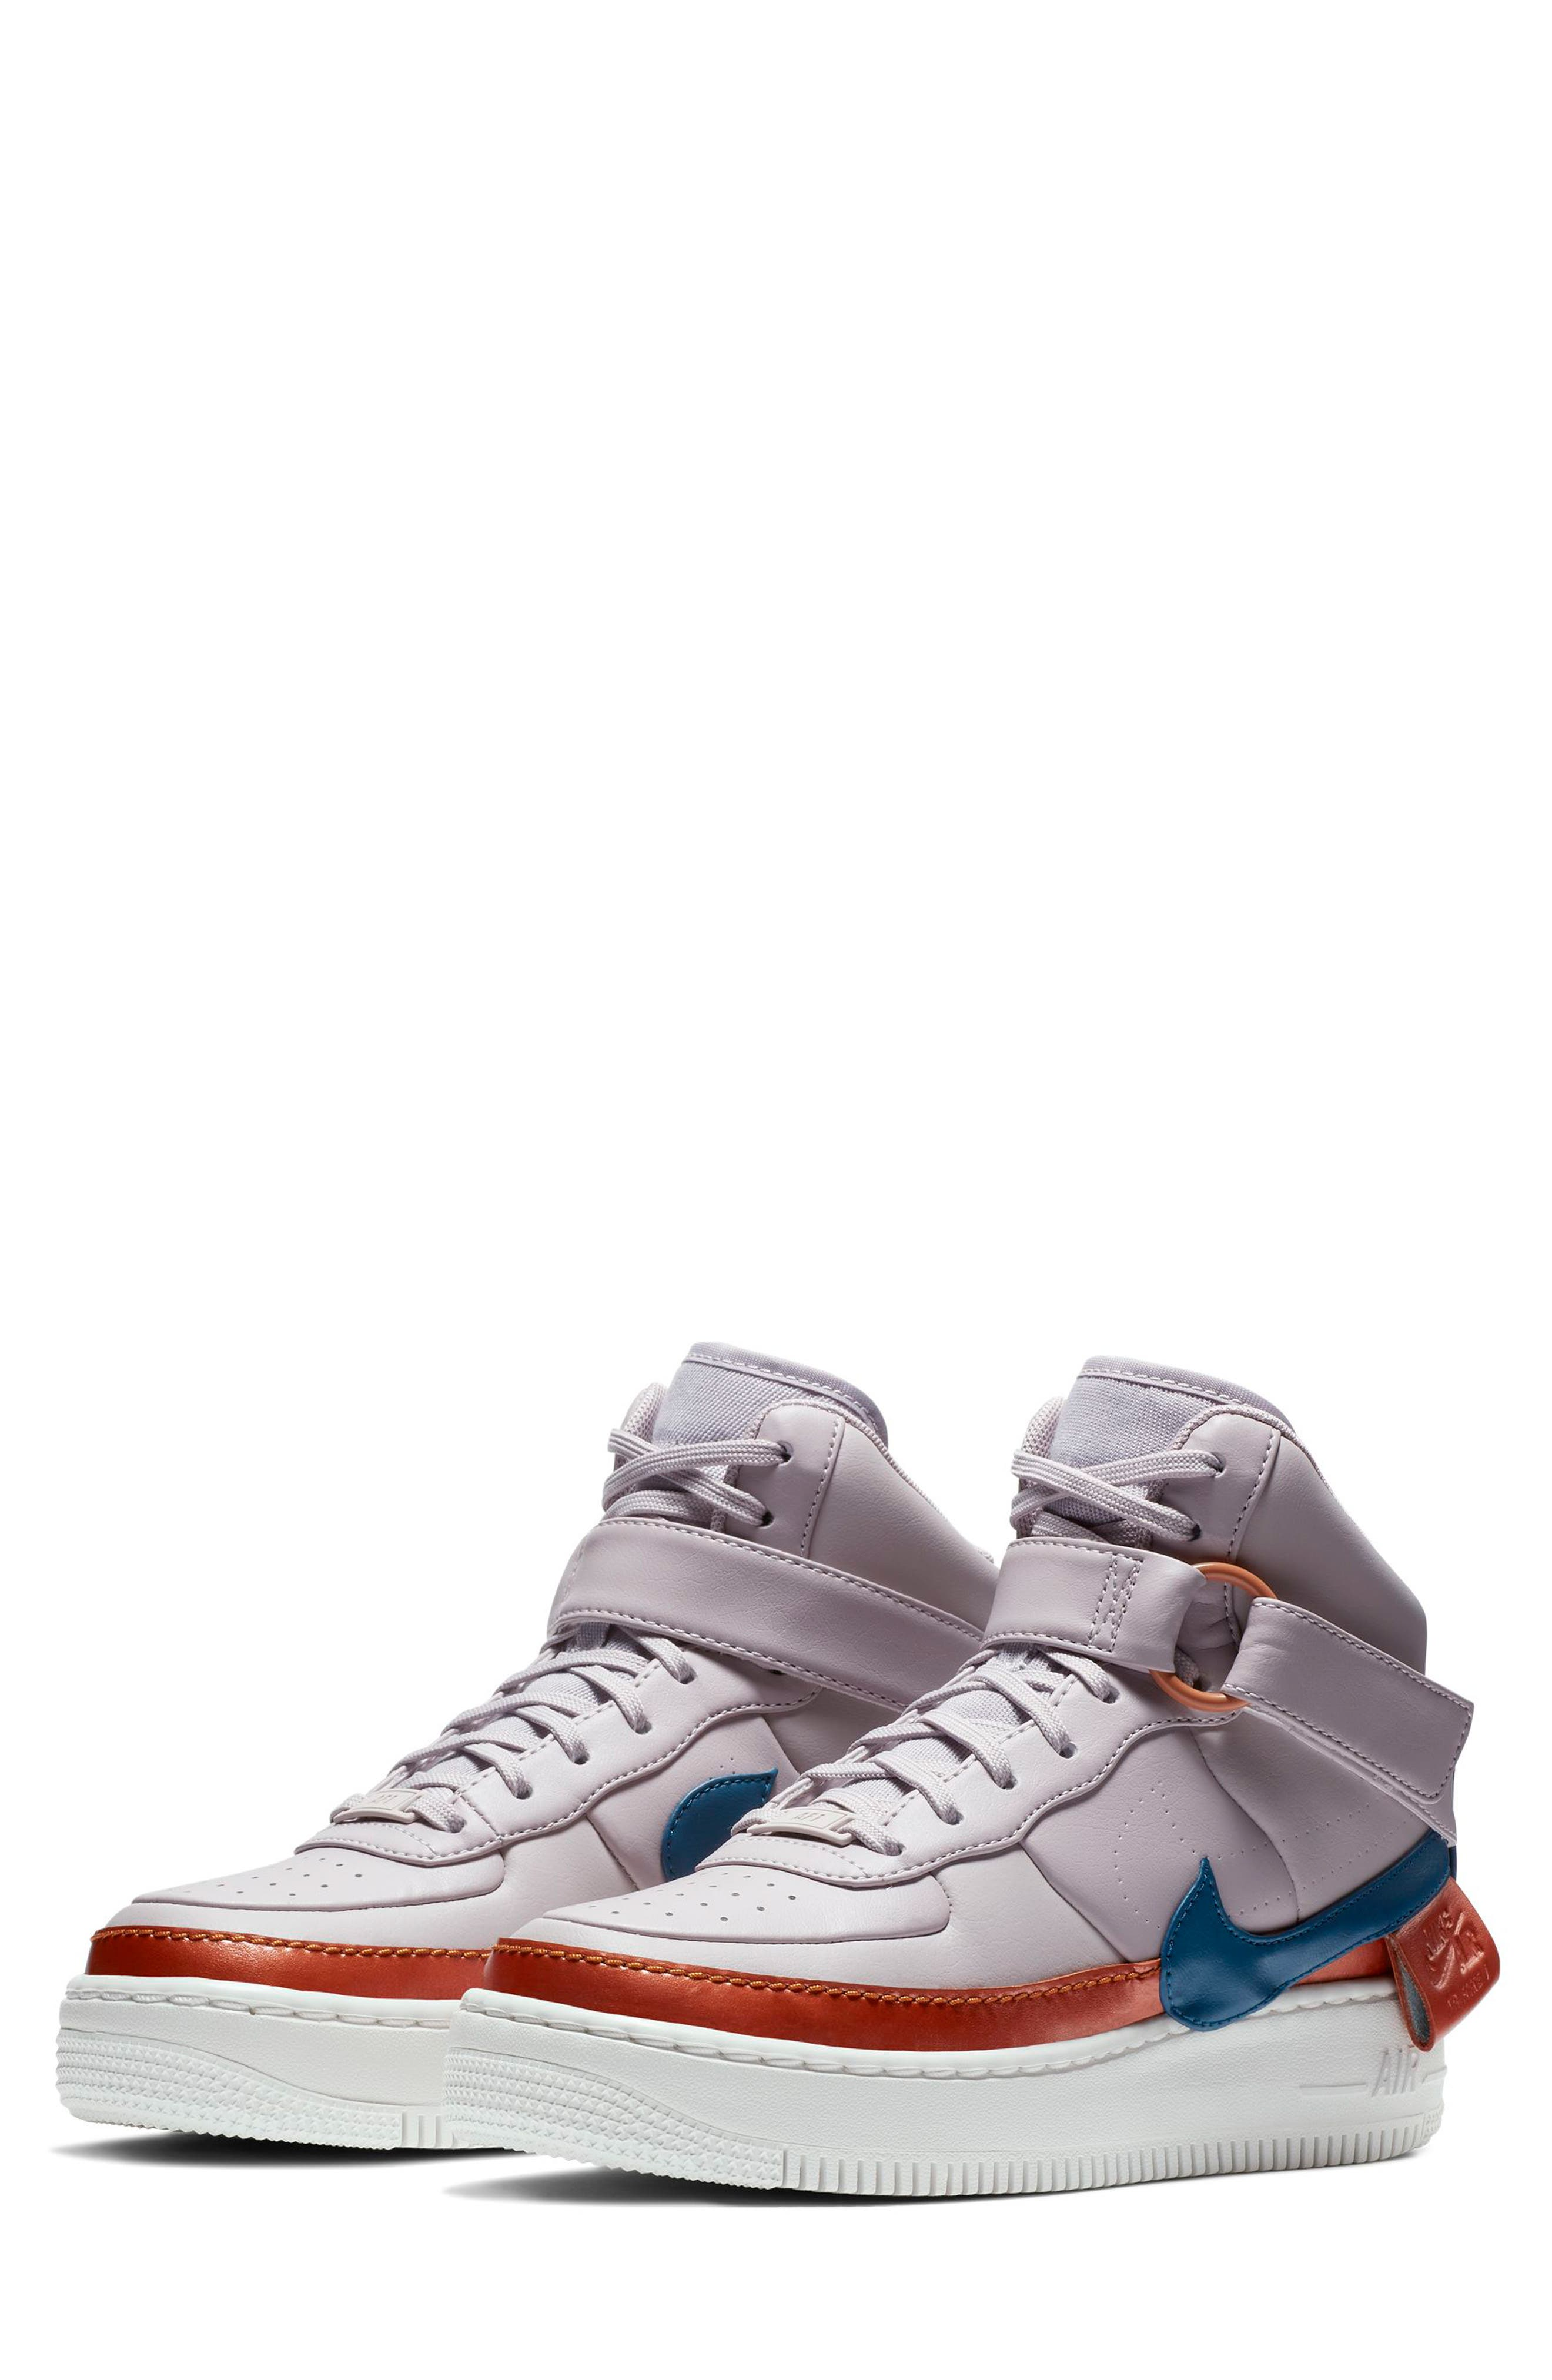 Nike Air Force 1 Jester High XX Sneaker